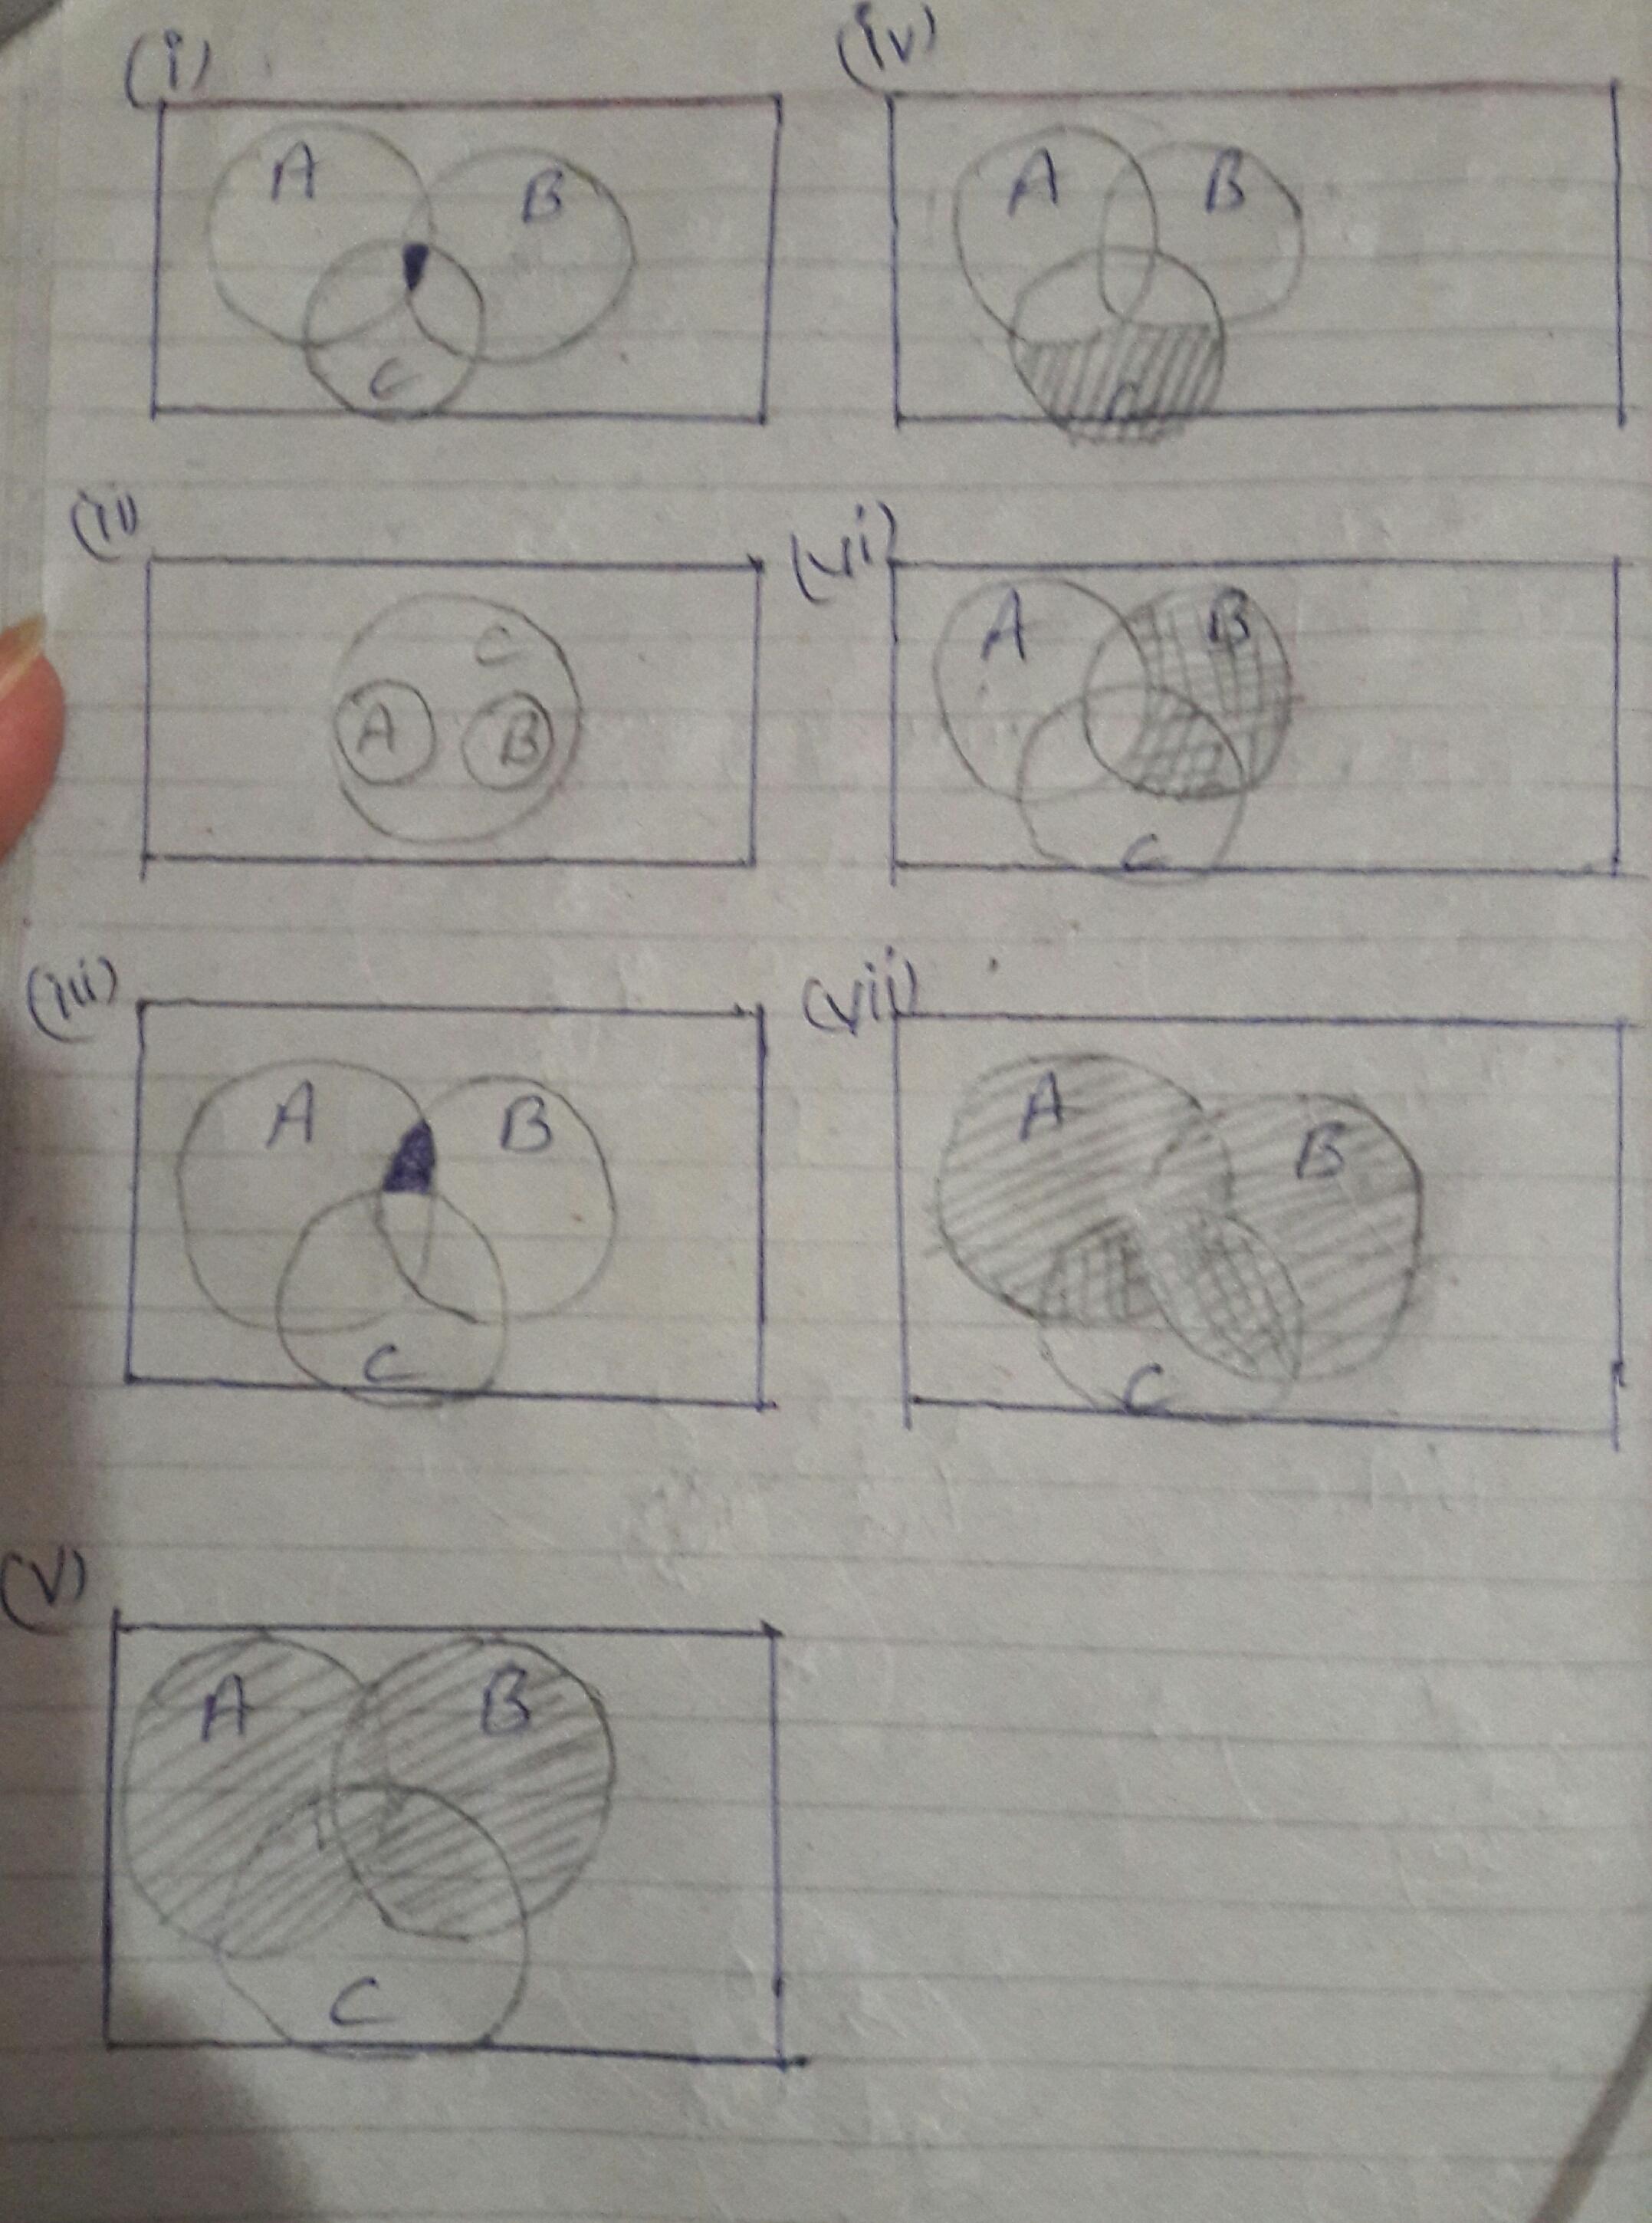 3 Draw Venn Diagram Of Three Sets A B And C Illustrating